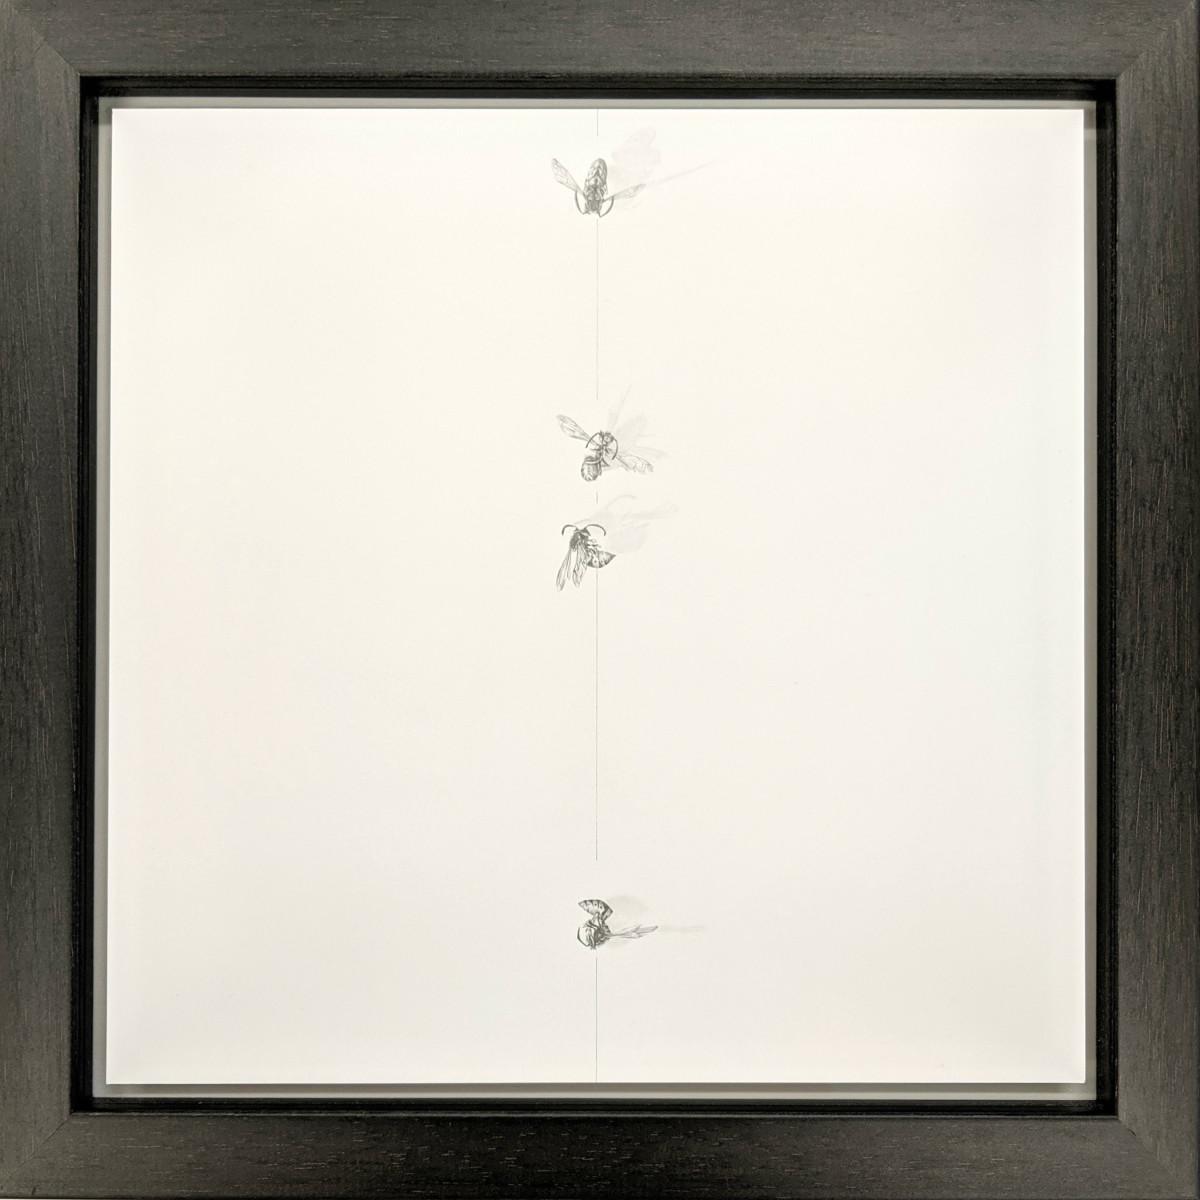 FlightPath xxxvi by Louisa Crispin